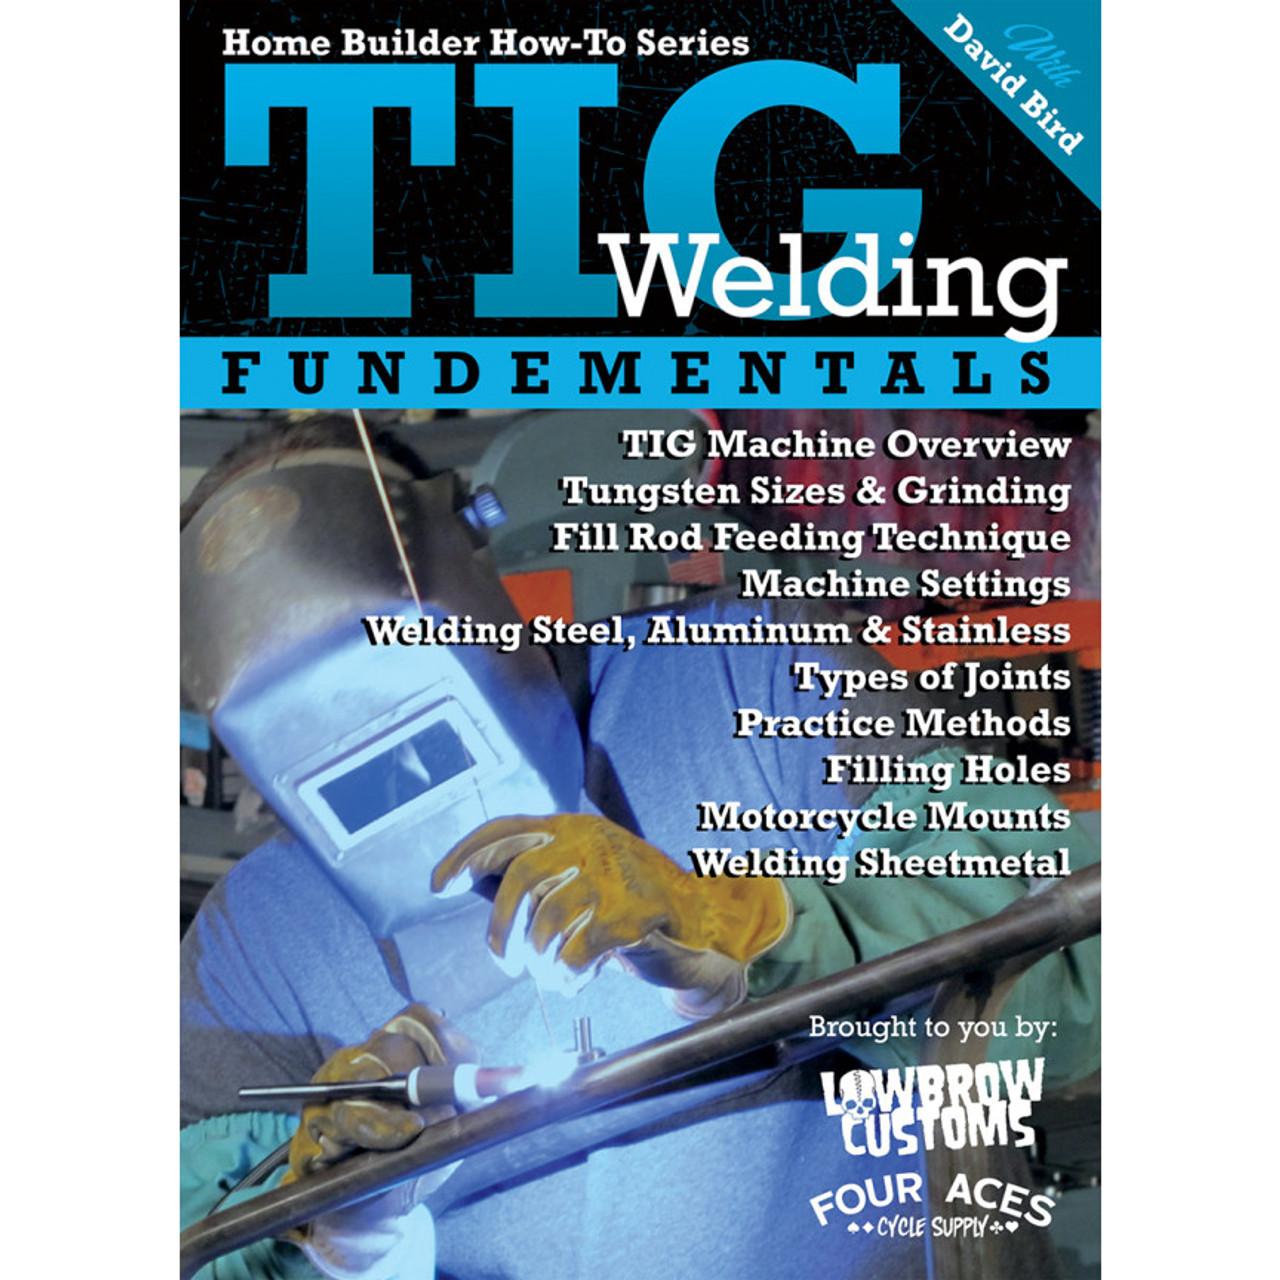 Lowbrow Customs TIG Welding Fundamentals with David Bird - Get ...